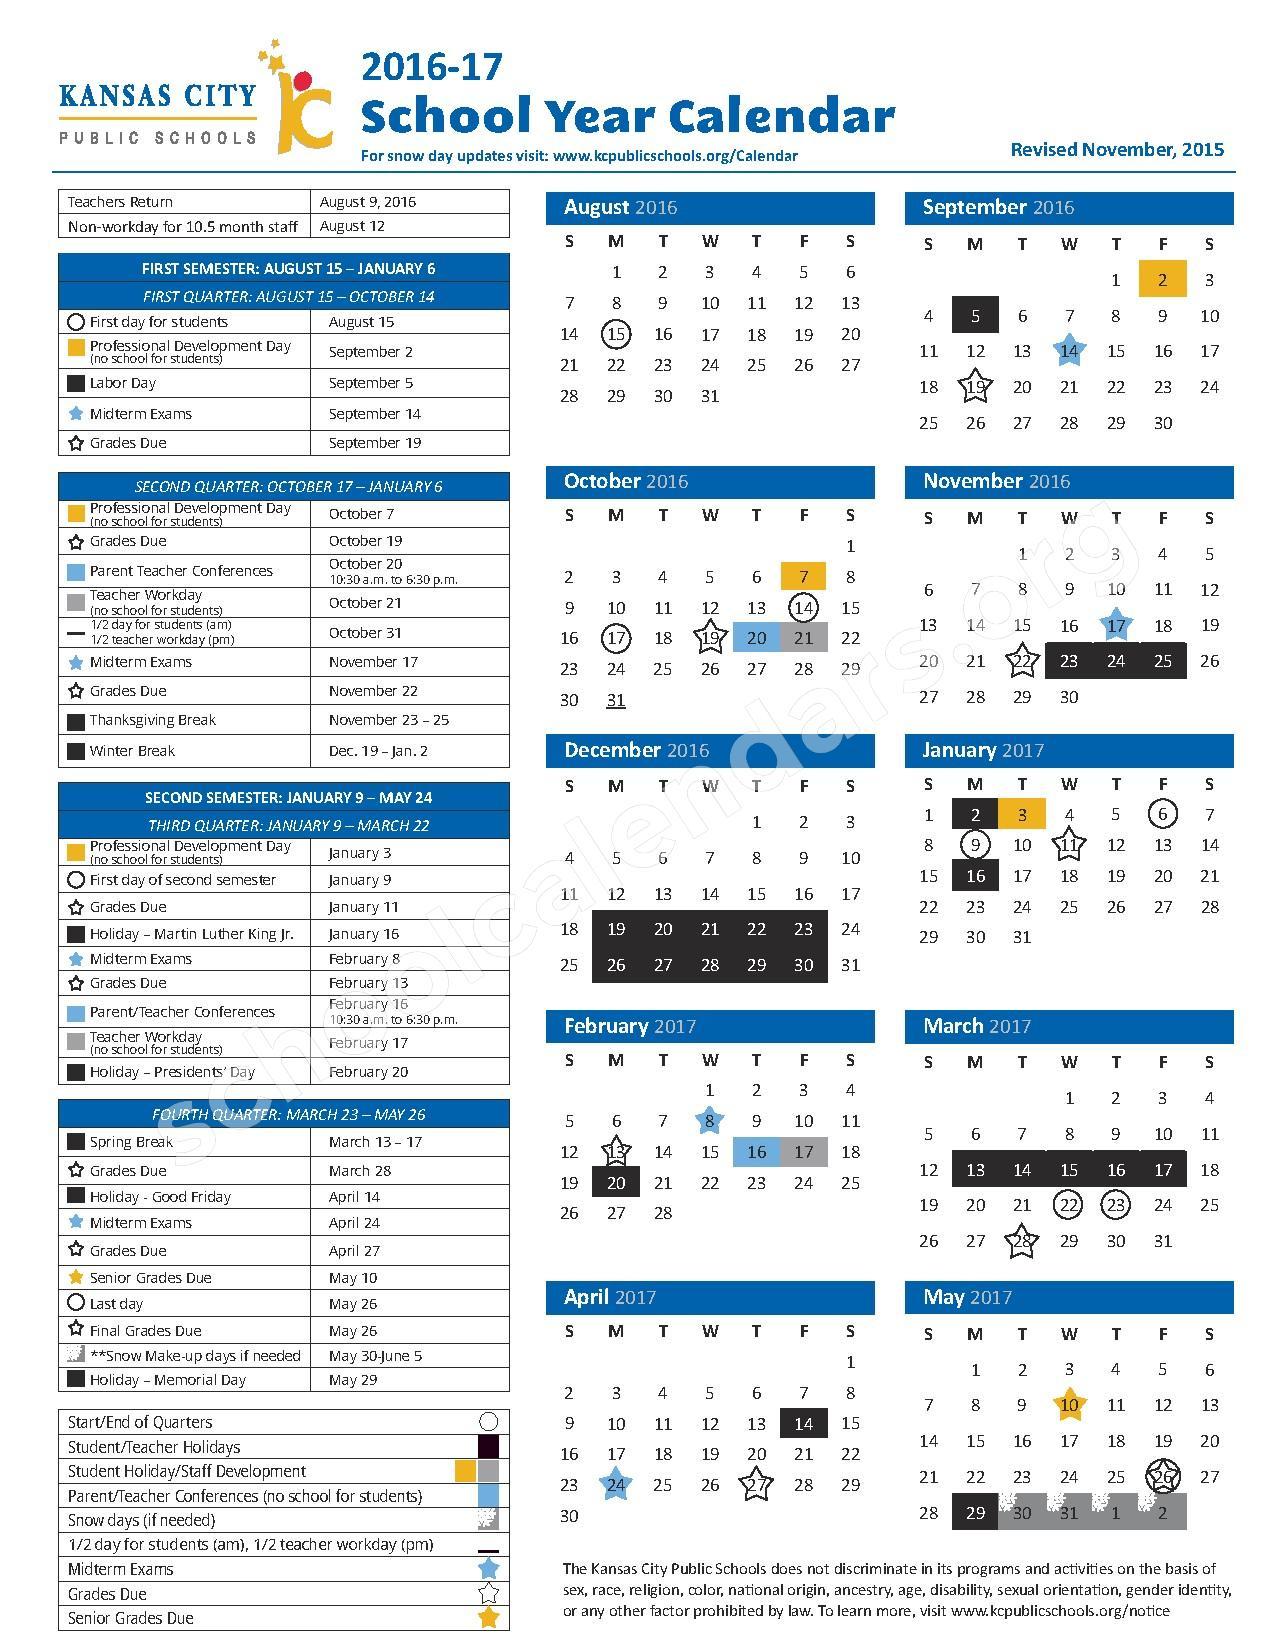 2016 - 2017 School Calendar – Wendell Phillips Elementary School – page 1